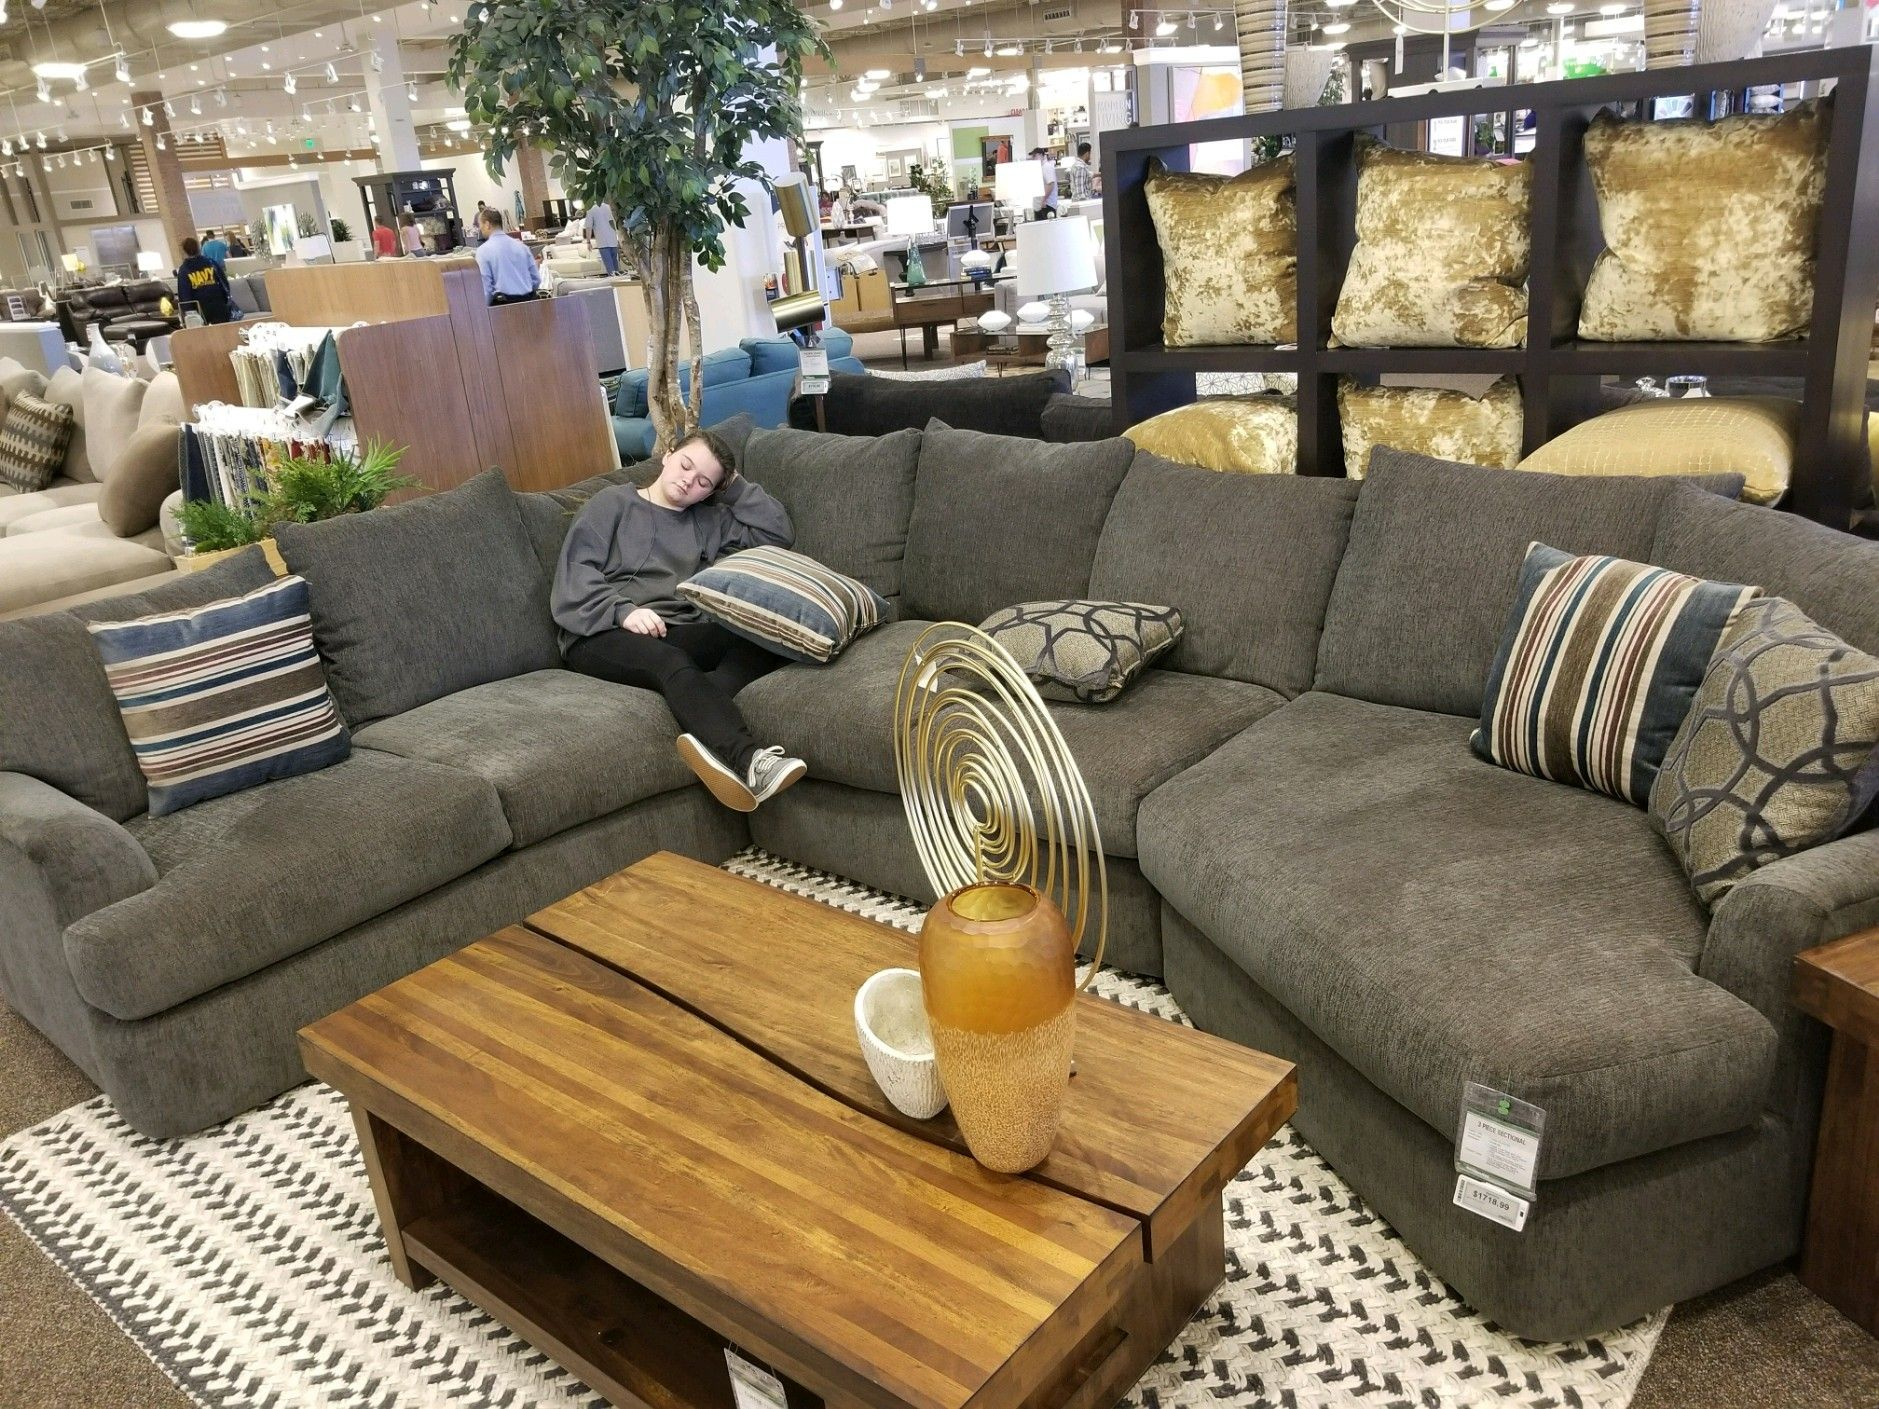 Nebraska Furniture Mart Couch I Want Furniture Nebraska